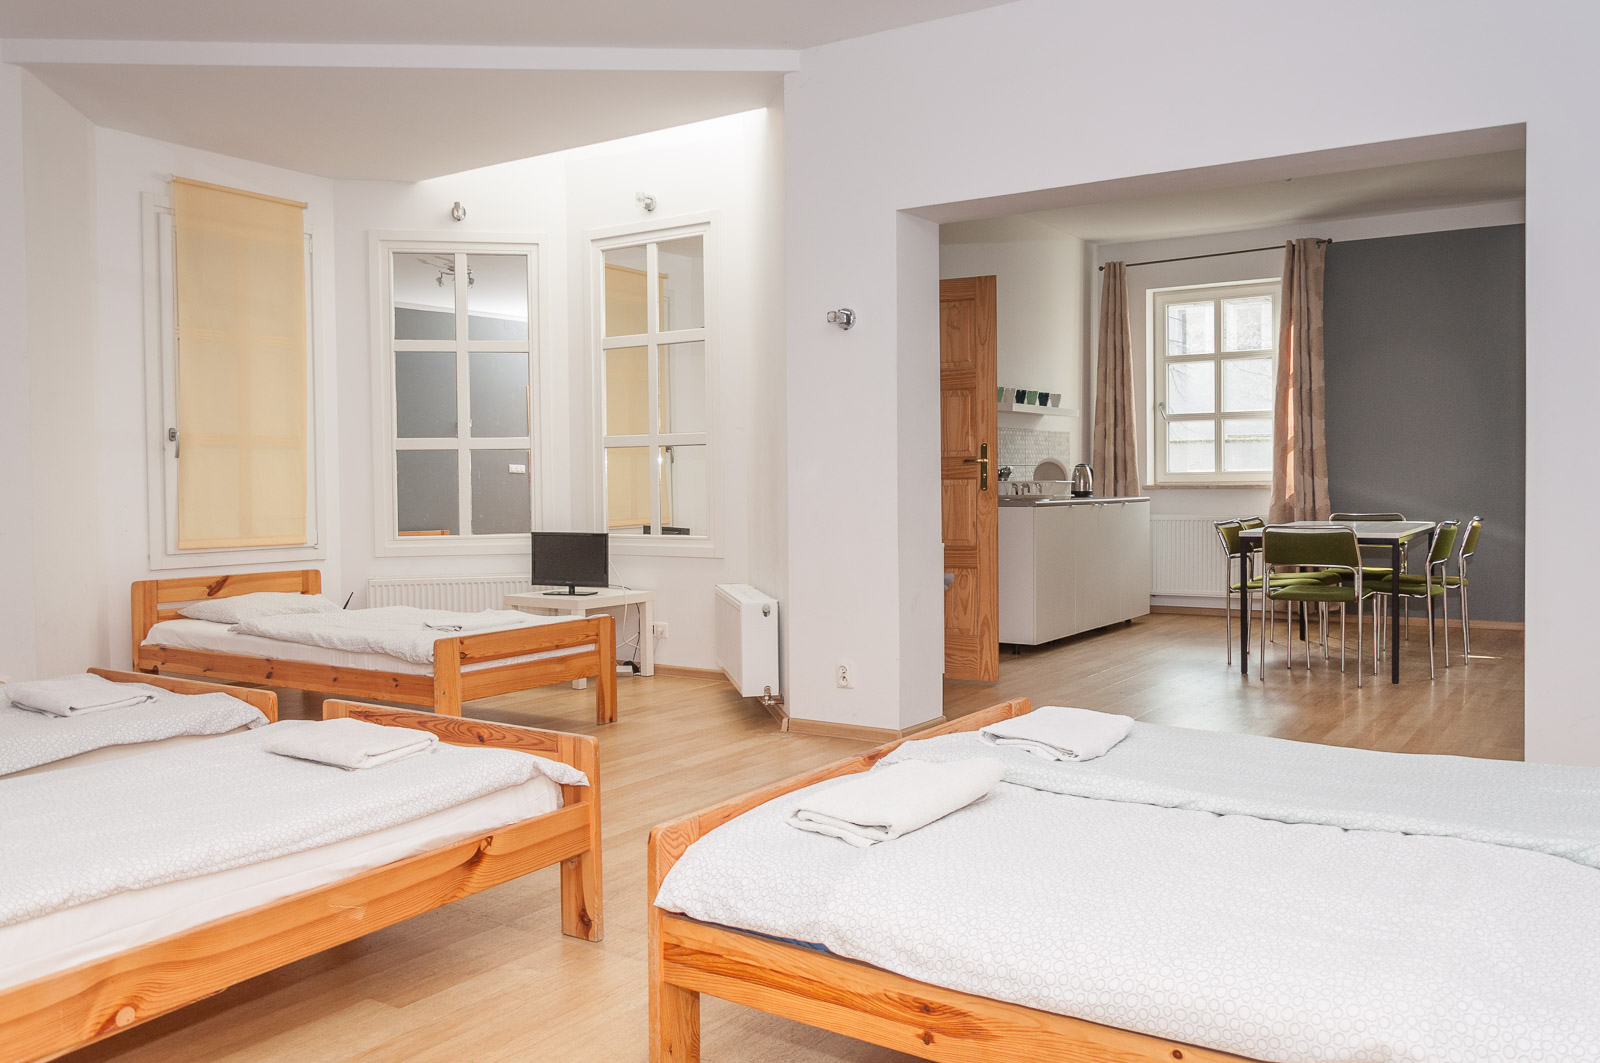 pokoje-na-wynajem-gdansk-jelitkowo_zlota-plaza_zp08_ad025562